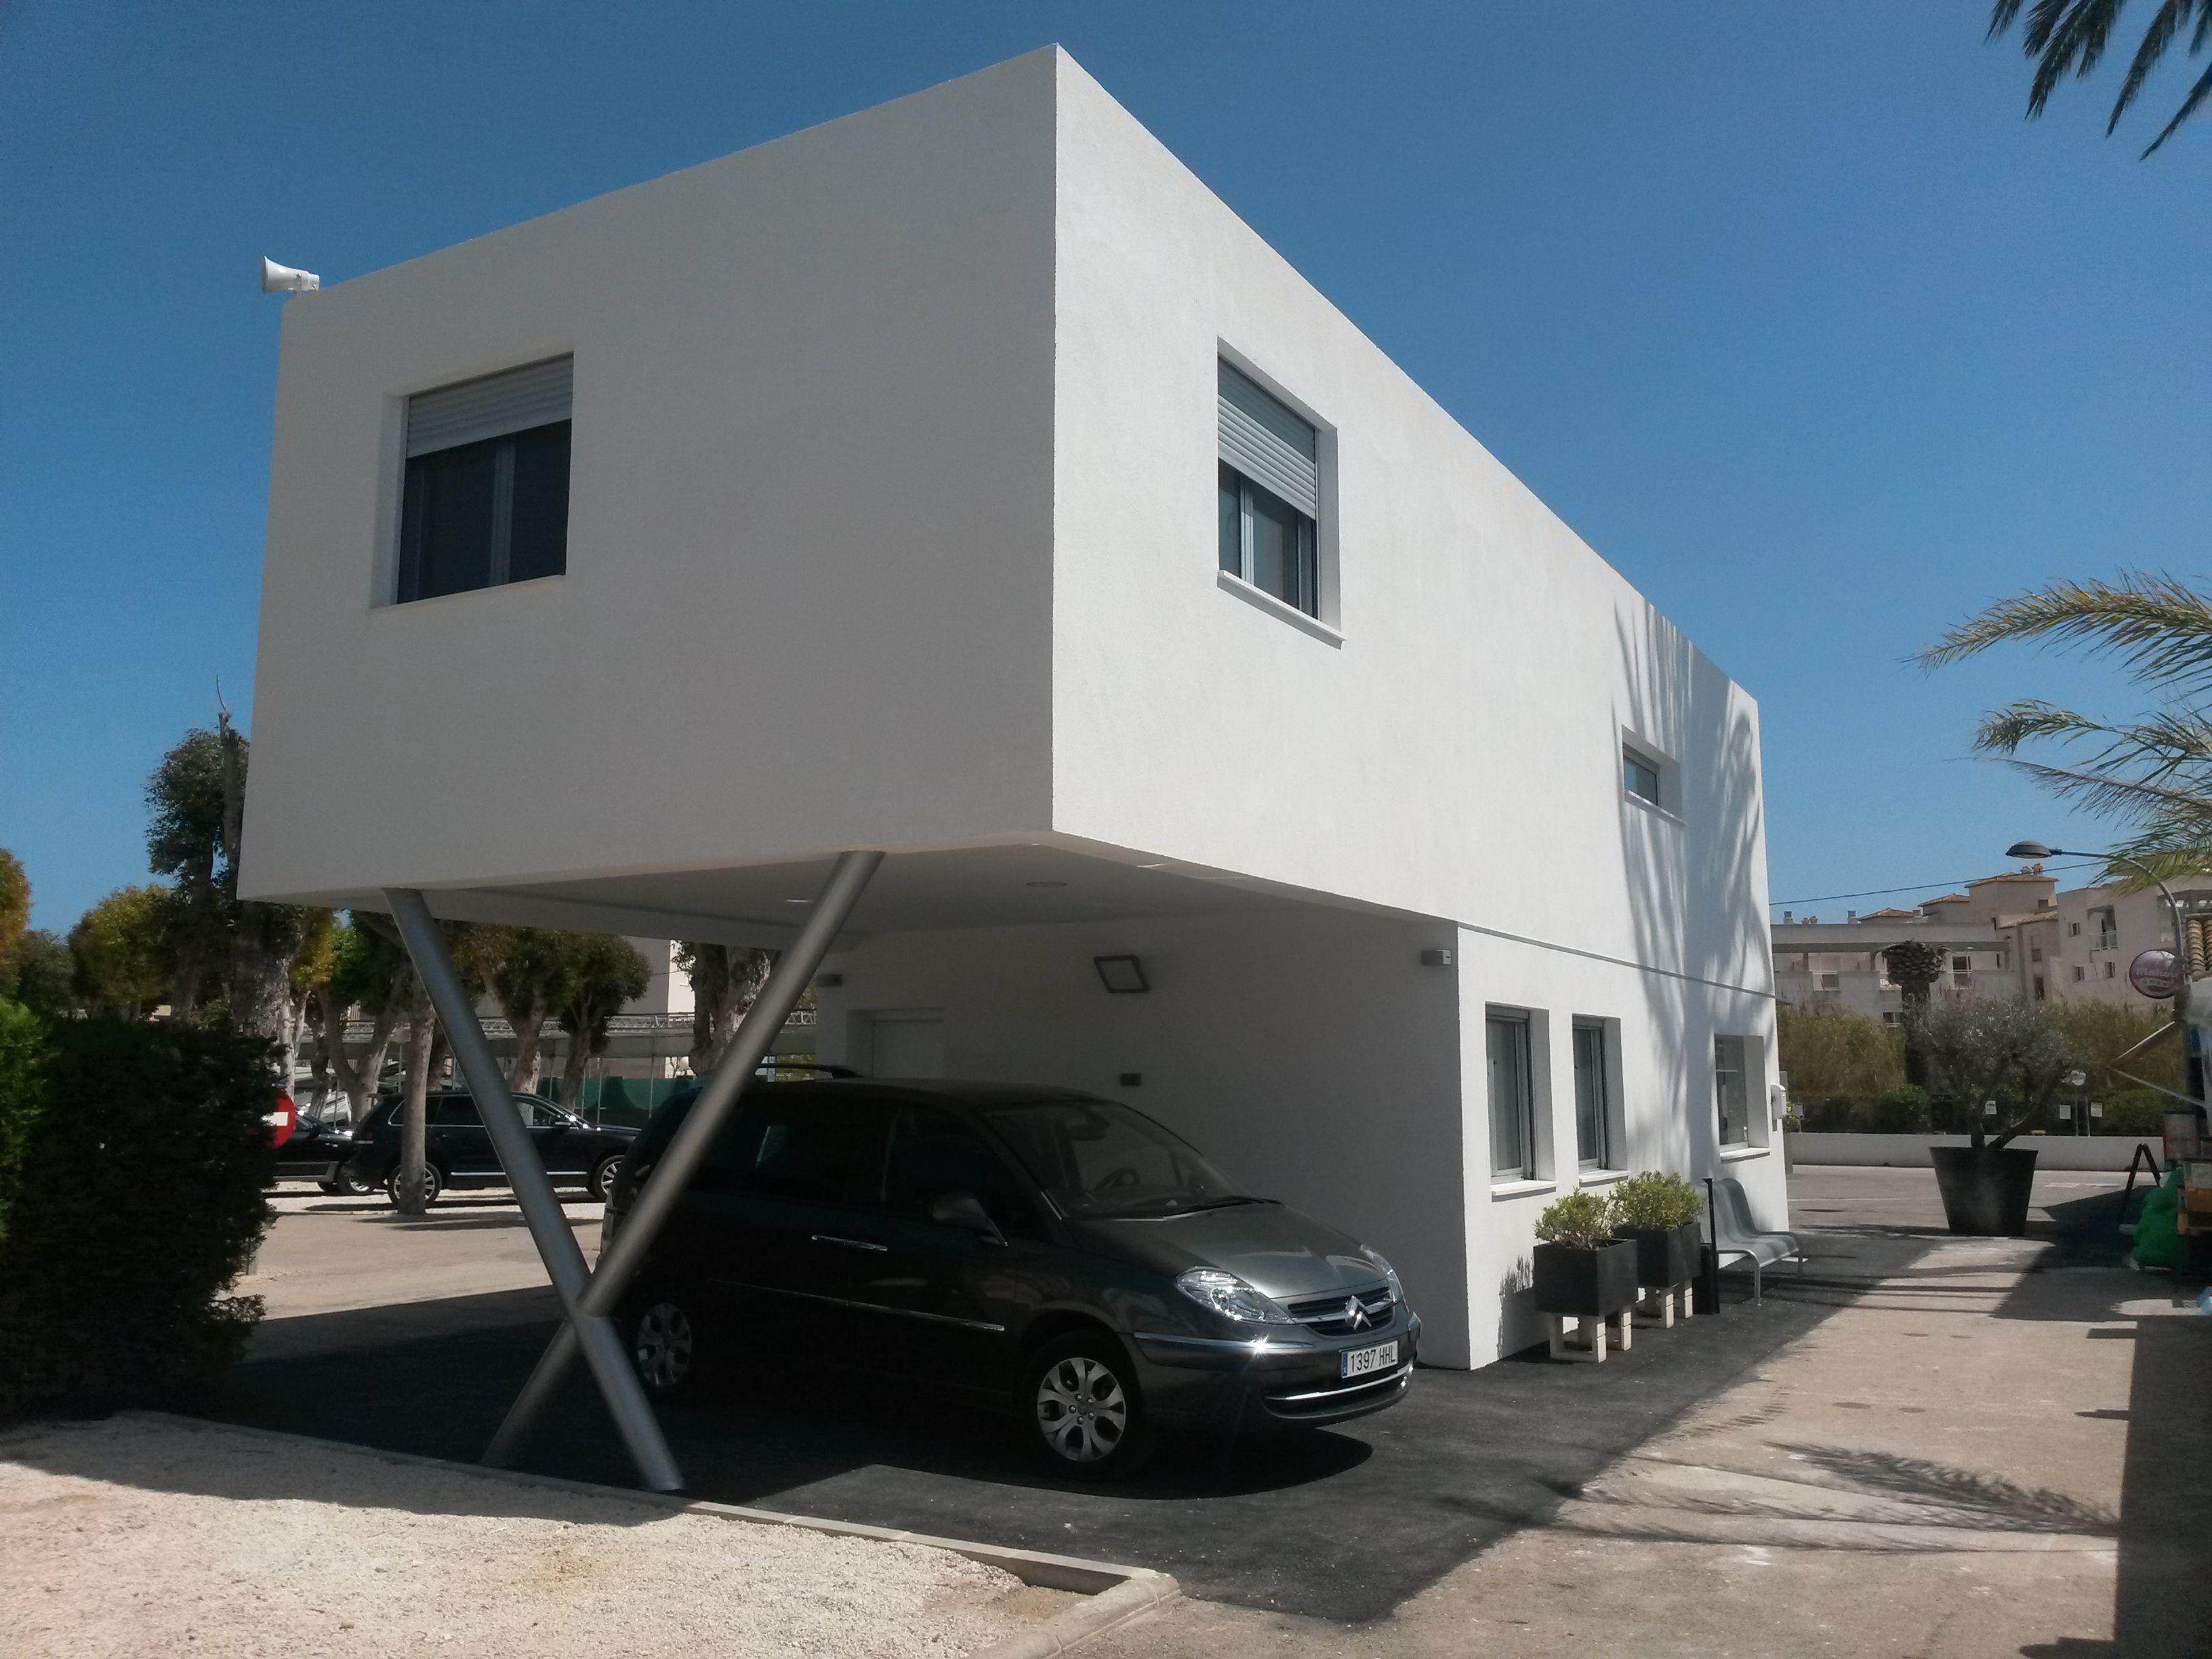 Casa fabricada reutilizando contenedores marítimos. Adaptada ...